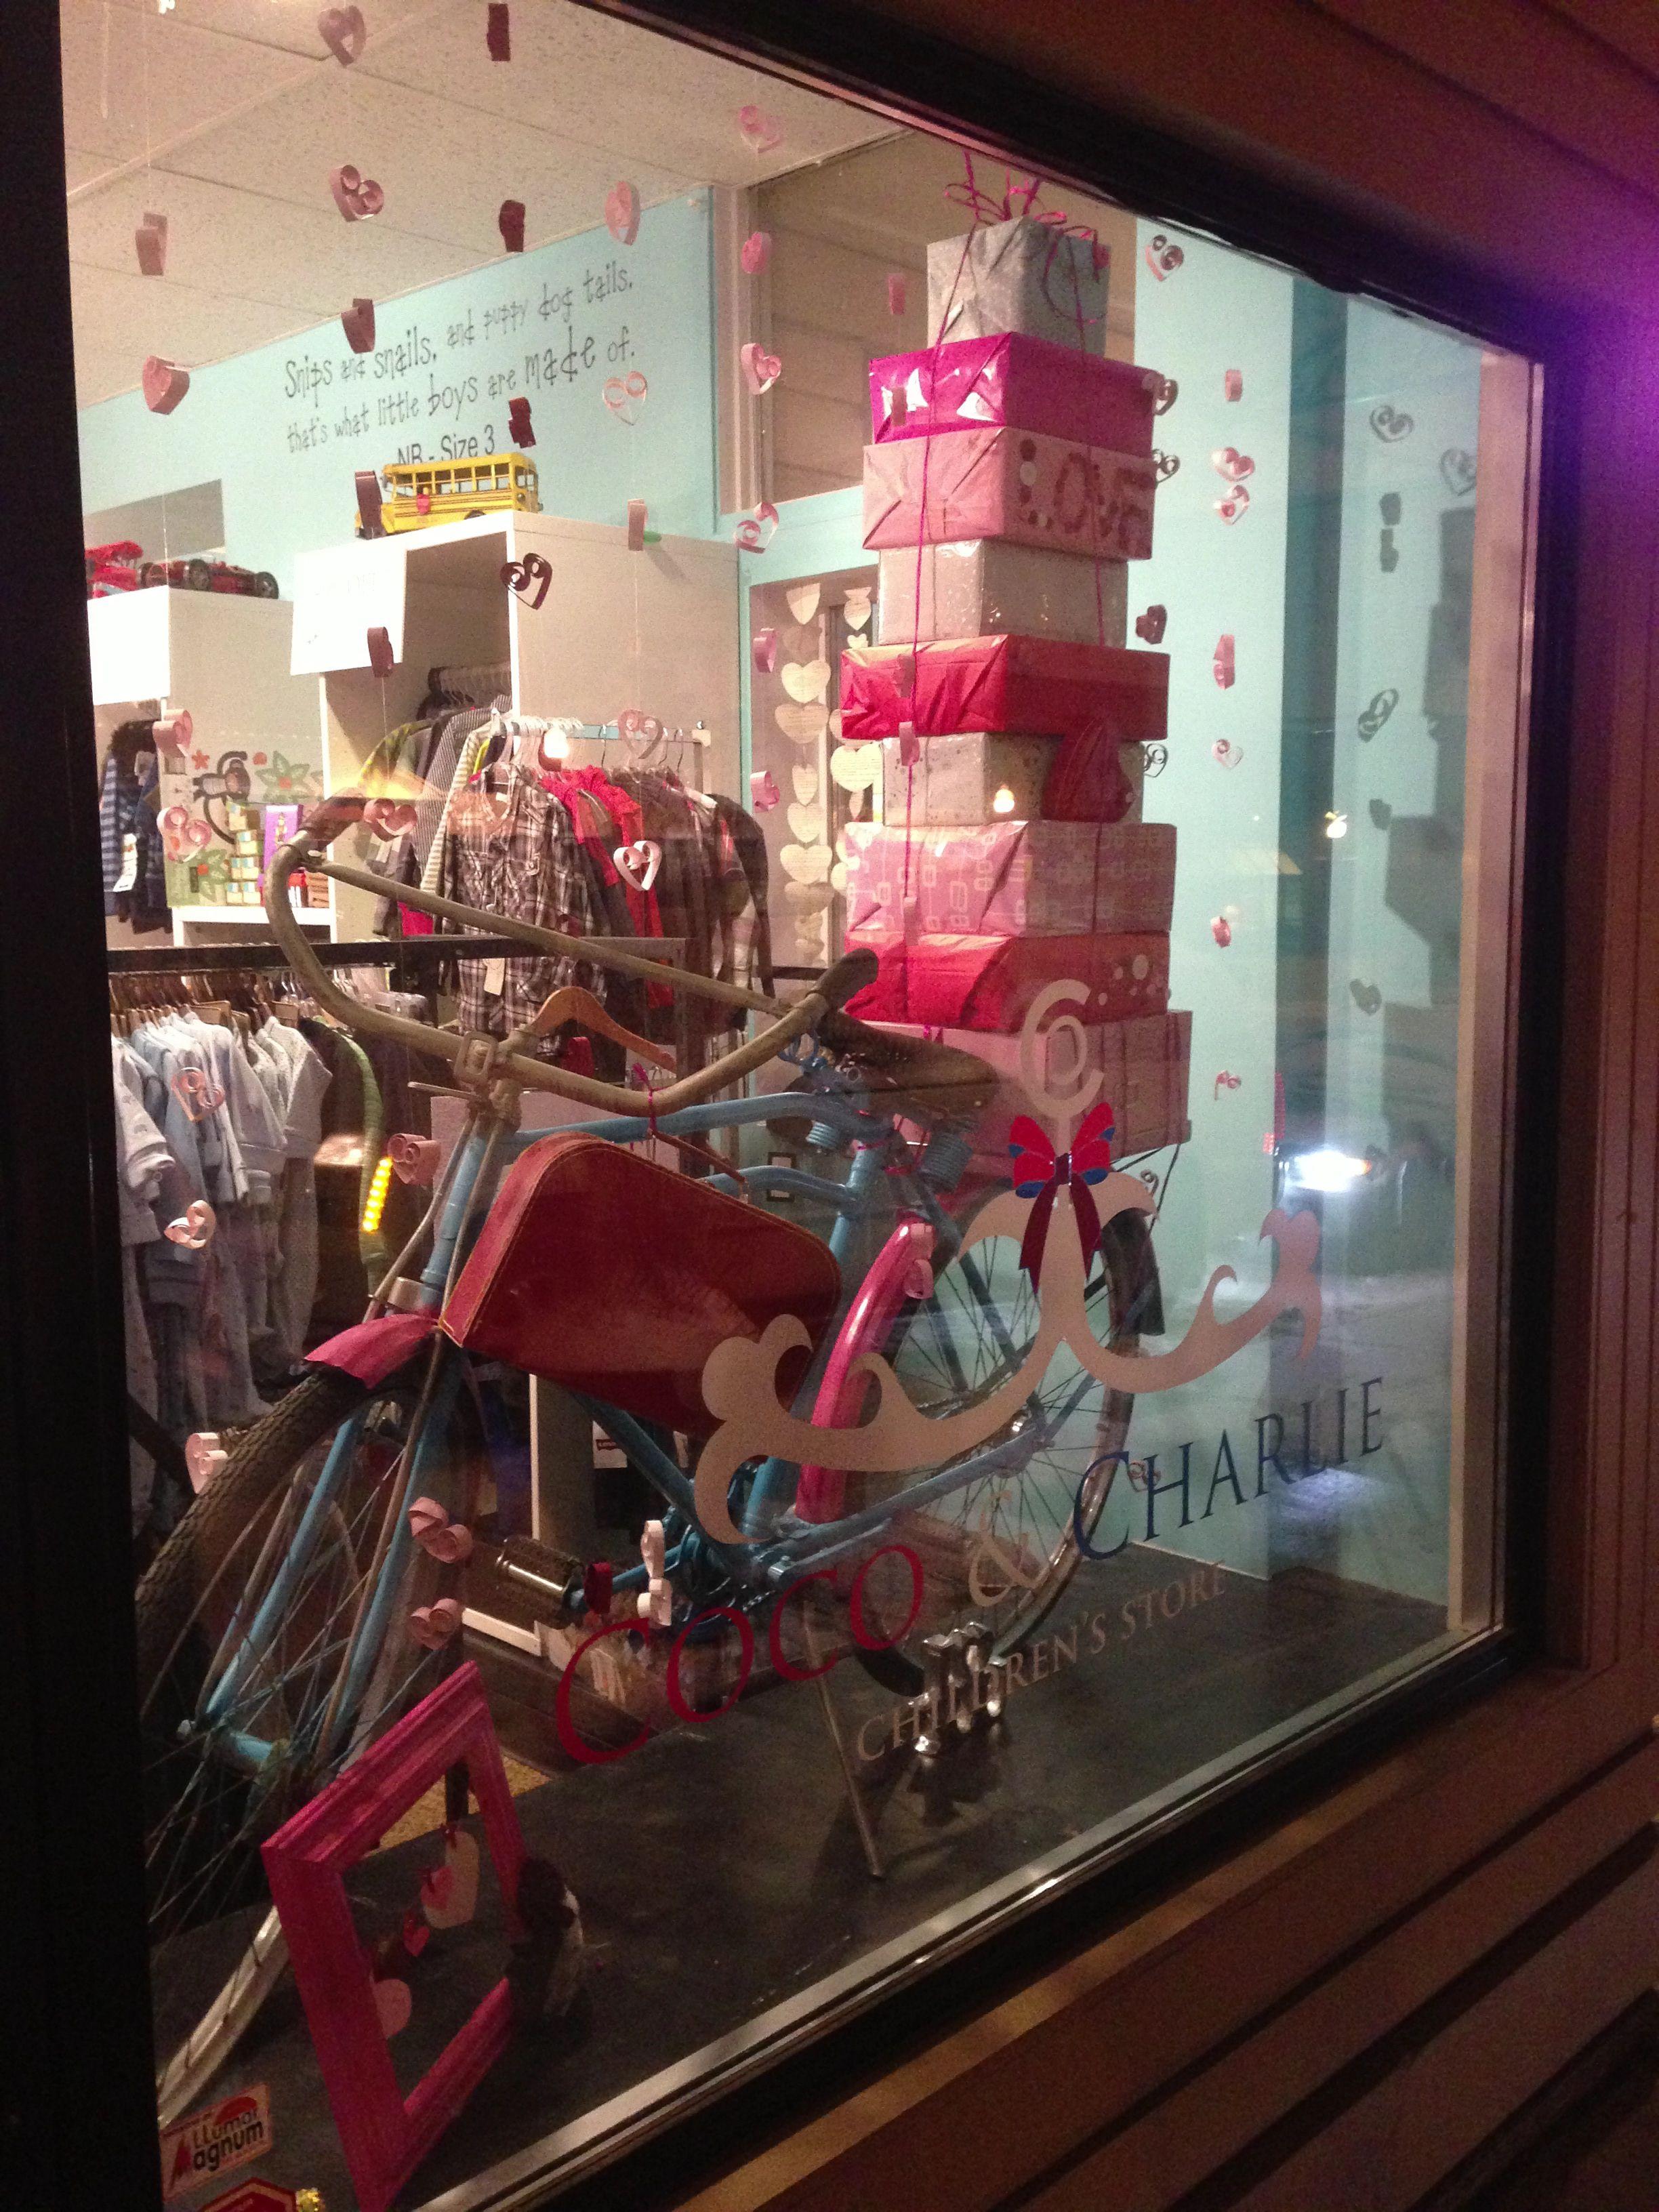 Coco charlie childrens store valentines day retail